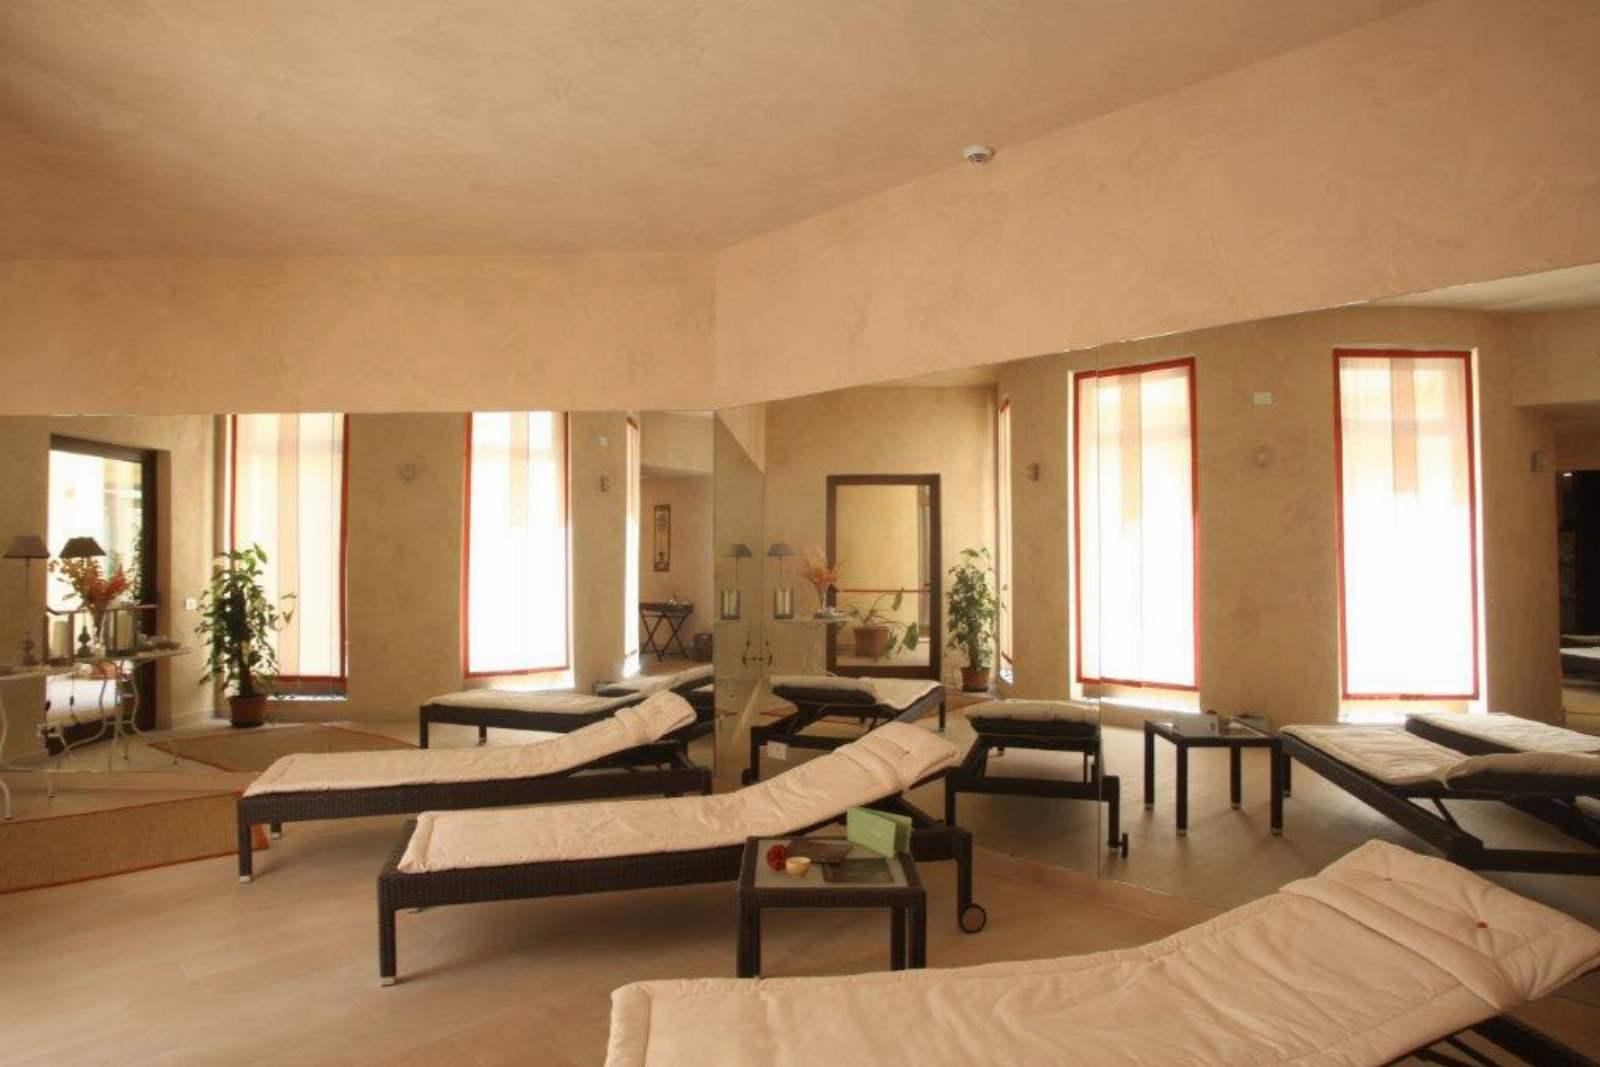 Falconara Resort & Spa: room / property / locale photo. Image 7